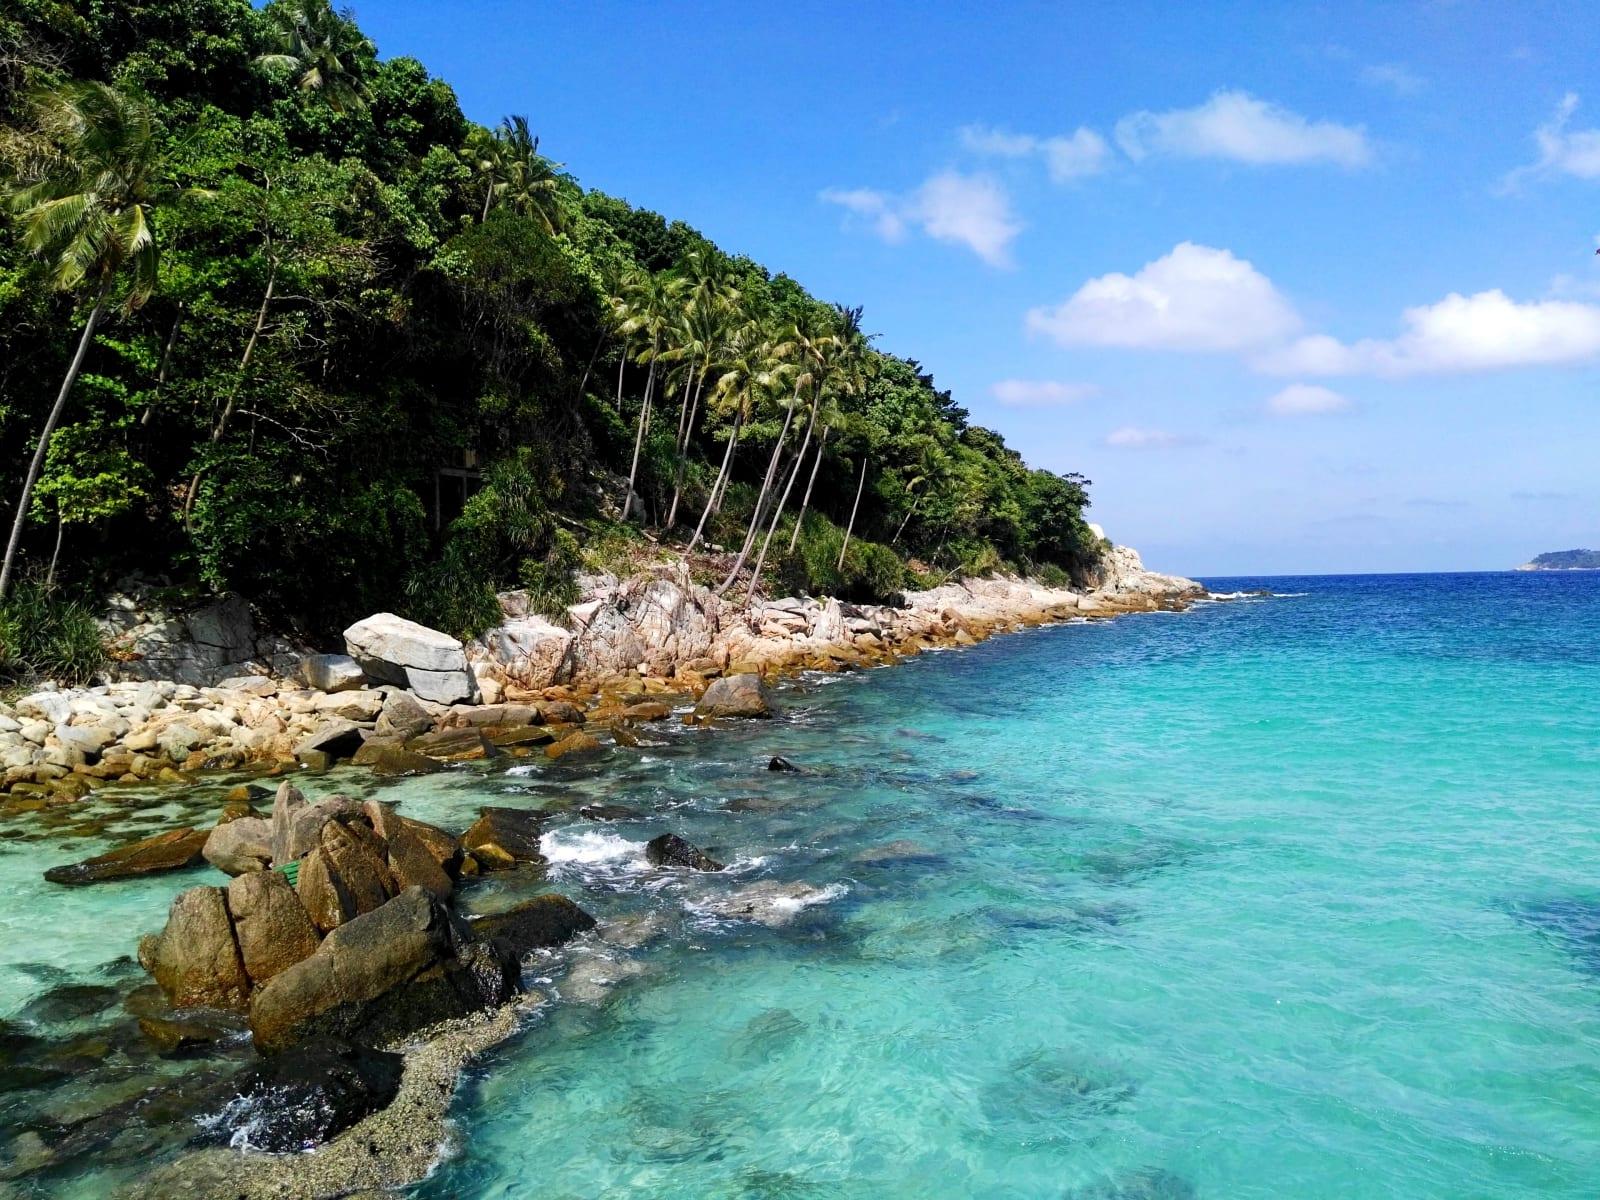 Kecil, Perhentian Islands, Malajsie